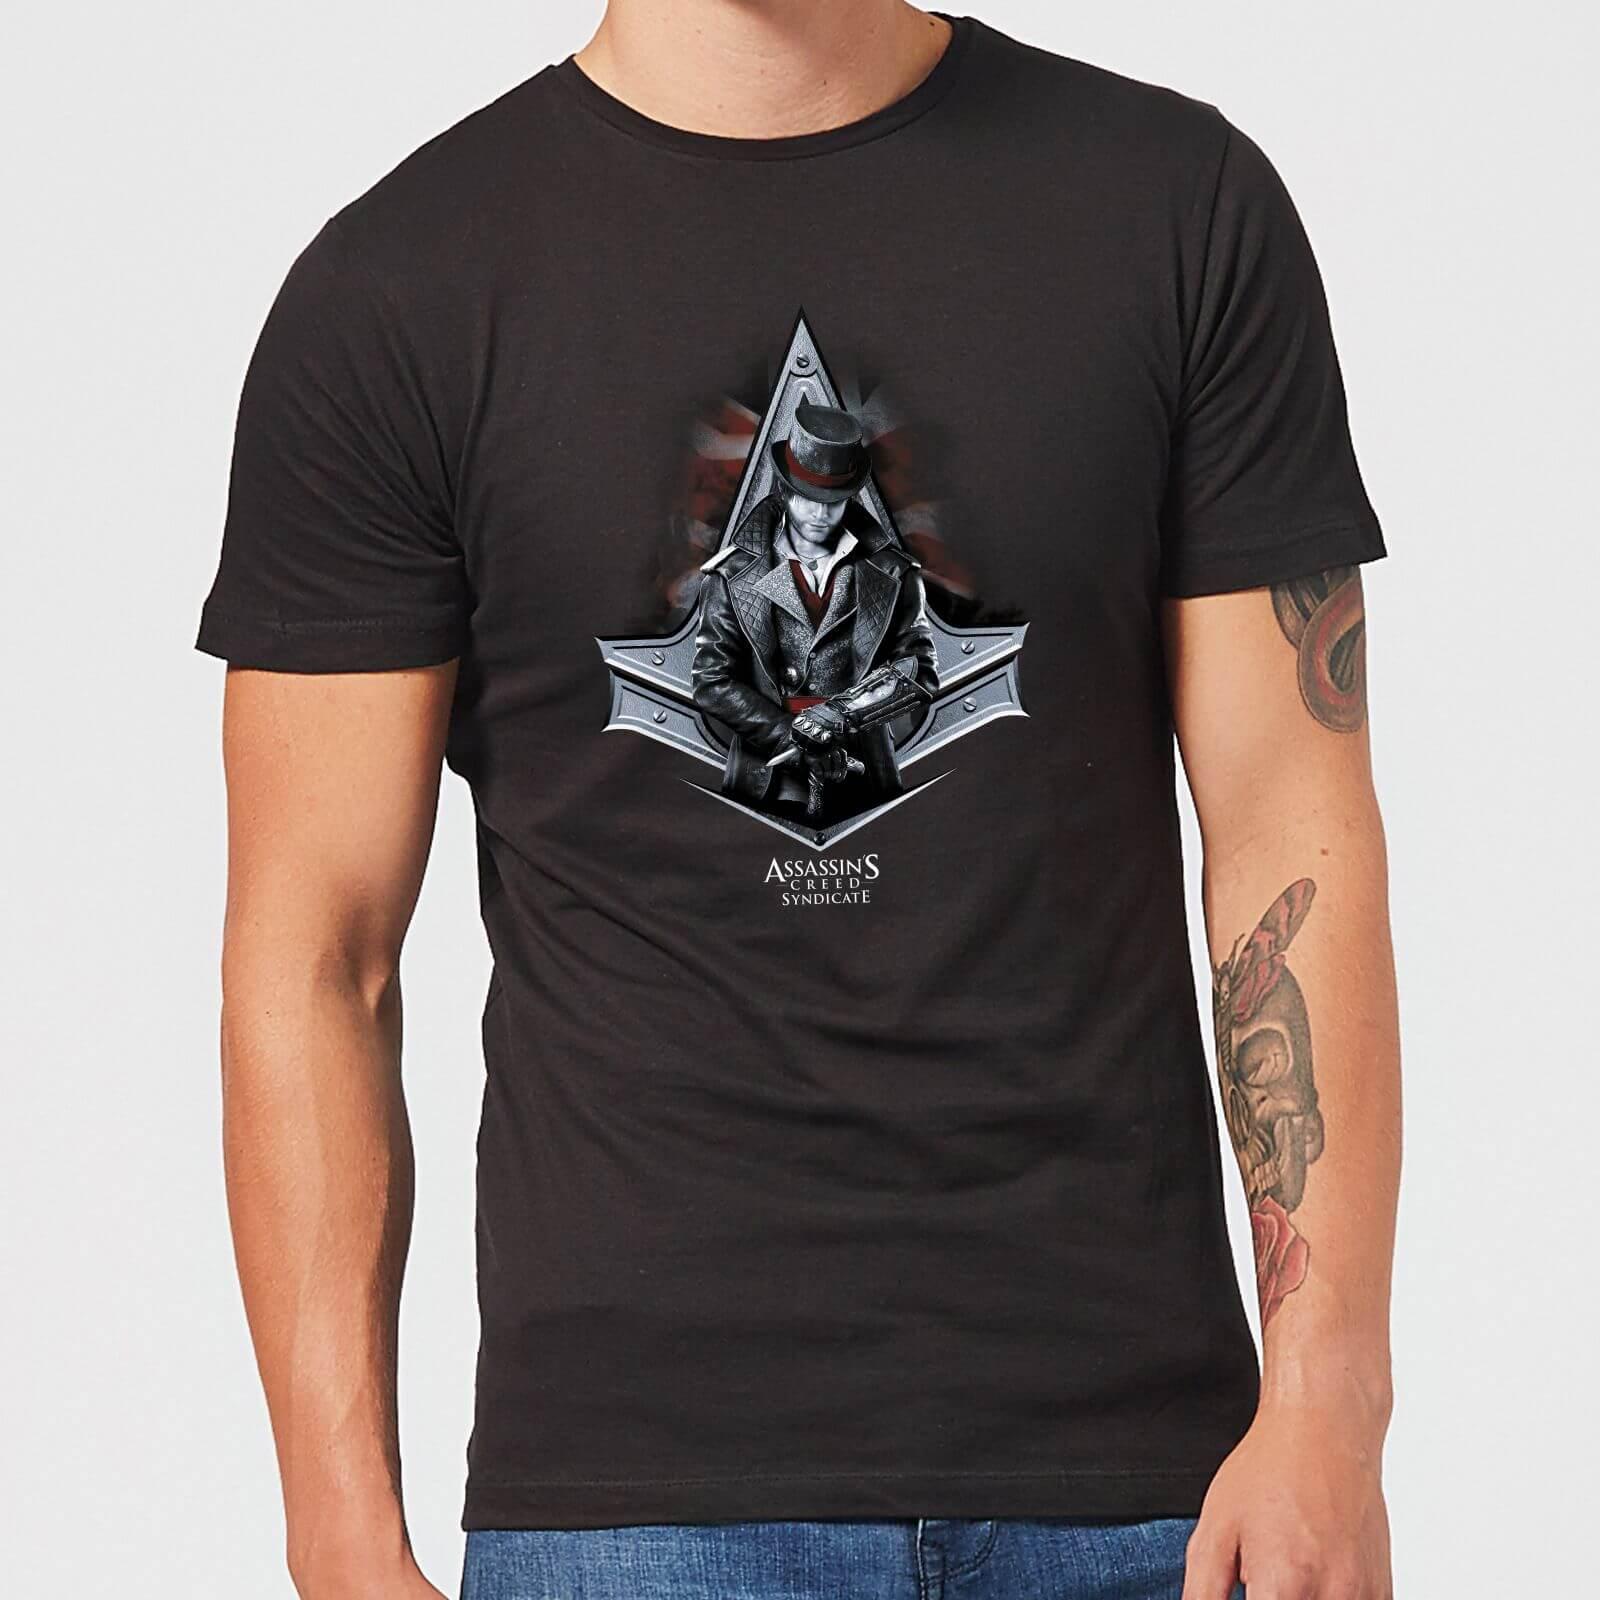 Assassin's Creed T-Shirt Homme Jacob Assassin's Creed Syndicate - Noir - M - Noir